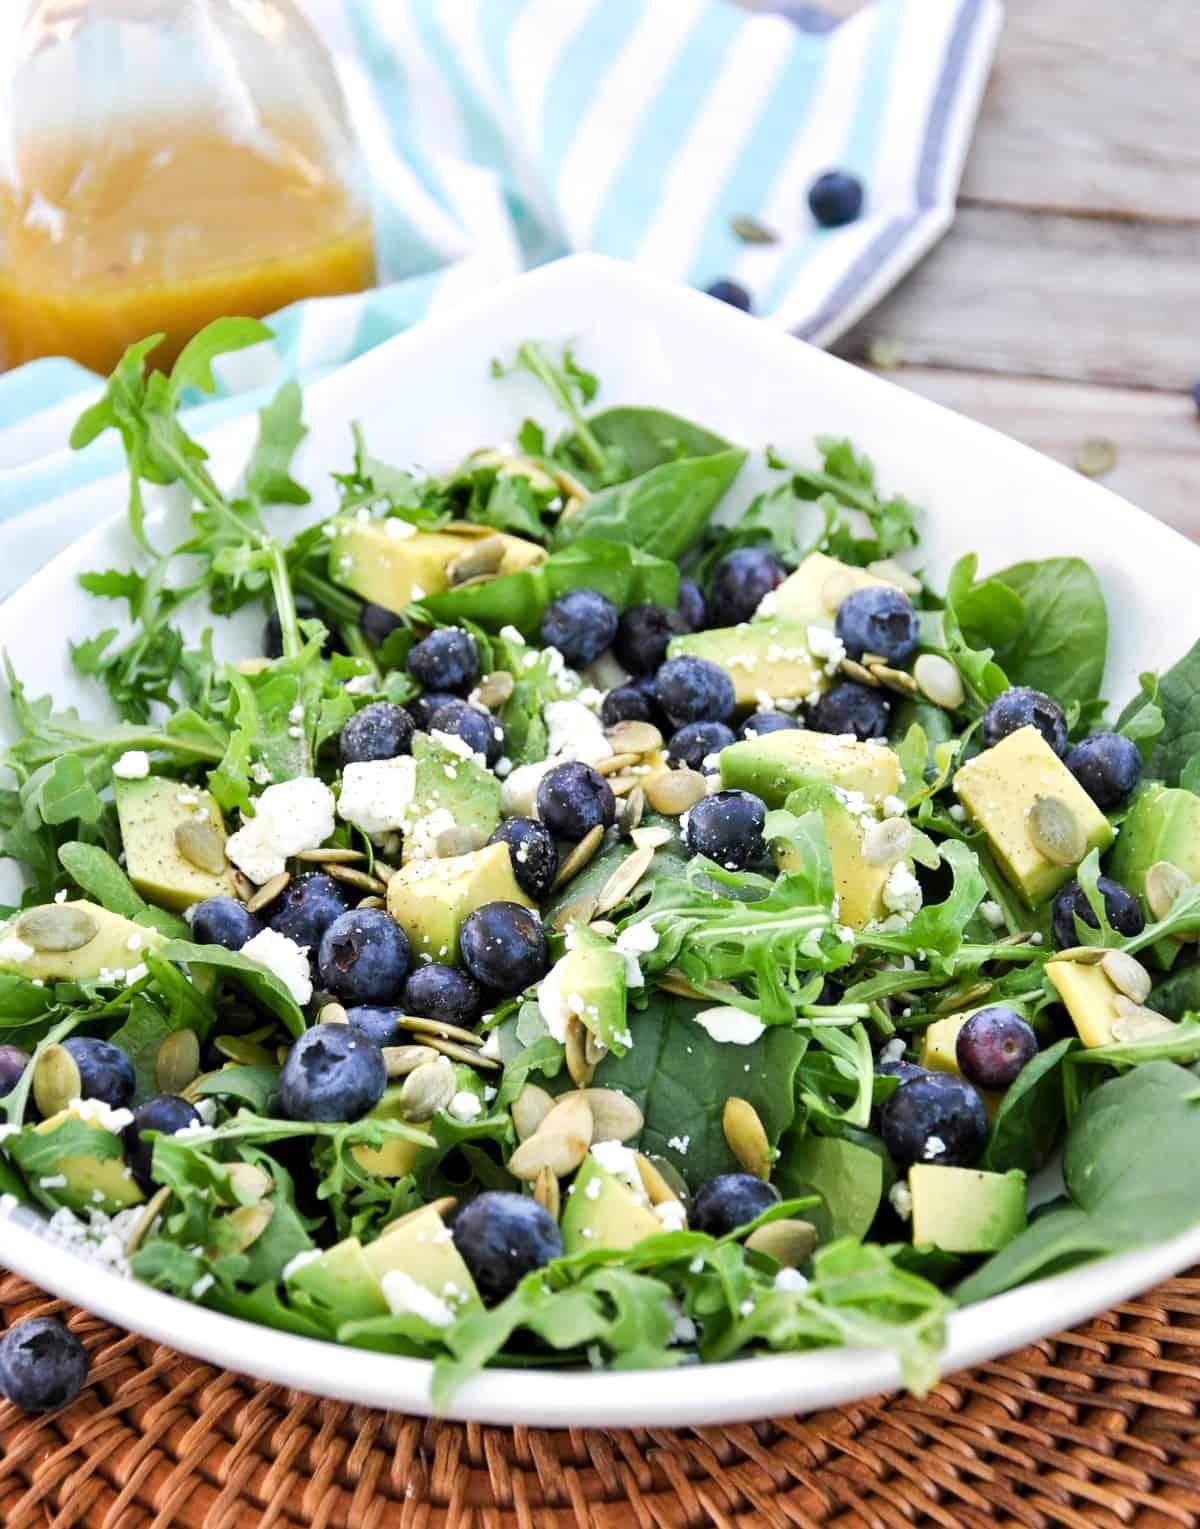 Blueberry Avocado Salad with feta, pumpkin seeds in a honey vinaigrette